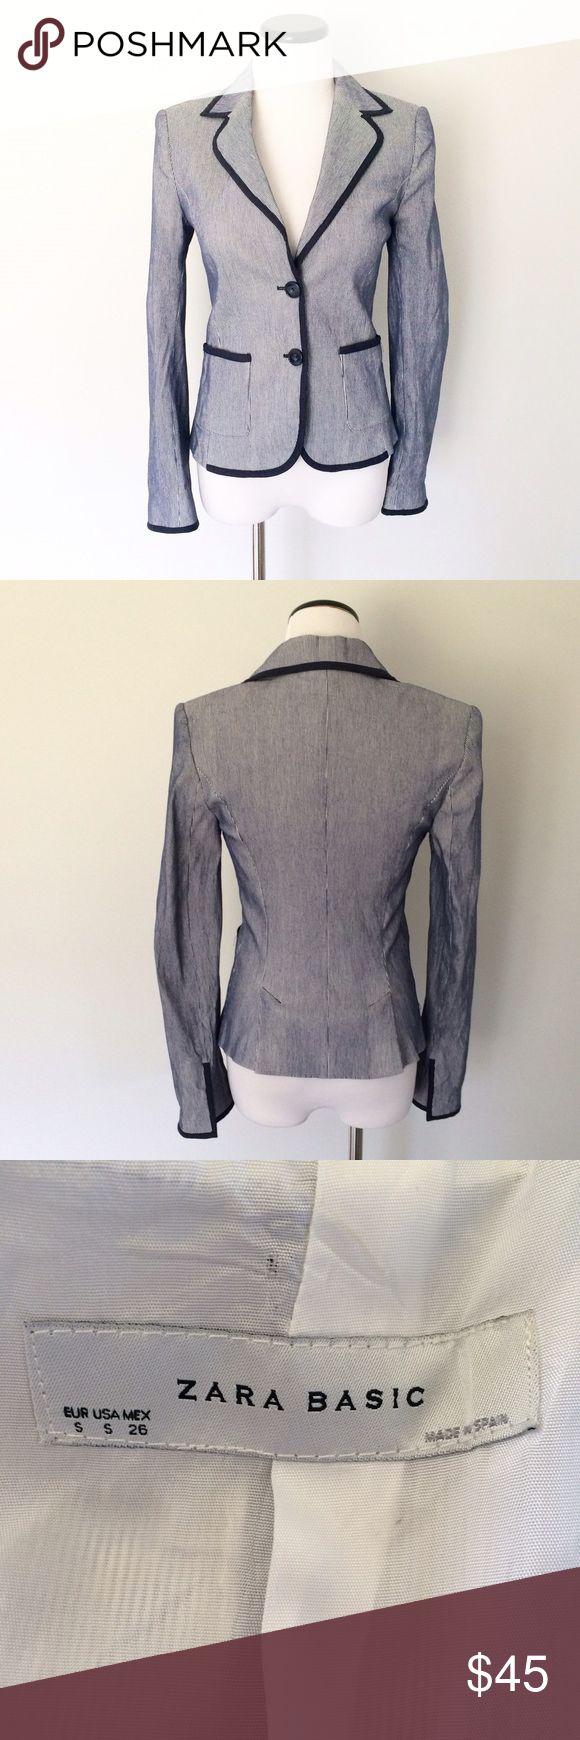 ZARA Navy blue white striped Blazer Jacket Worn once. Navy blue and white blazer. Two buttons on front. White lining. Zara Jackets & Coats Blazers